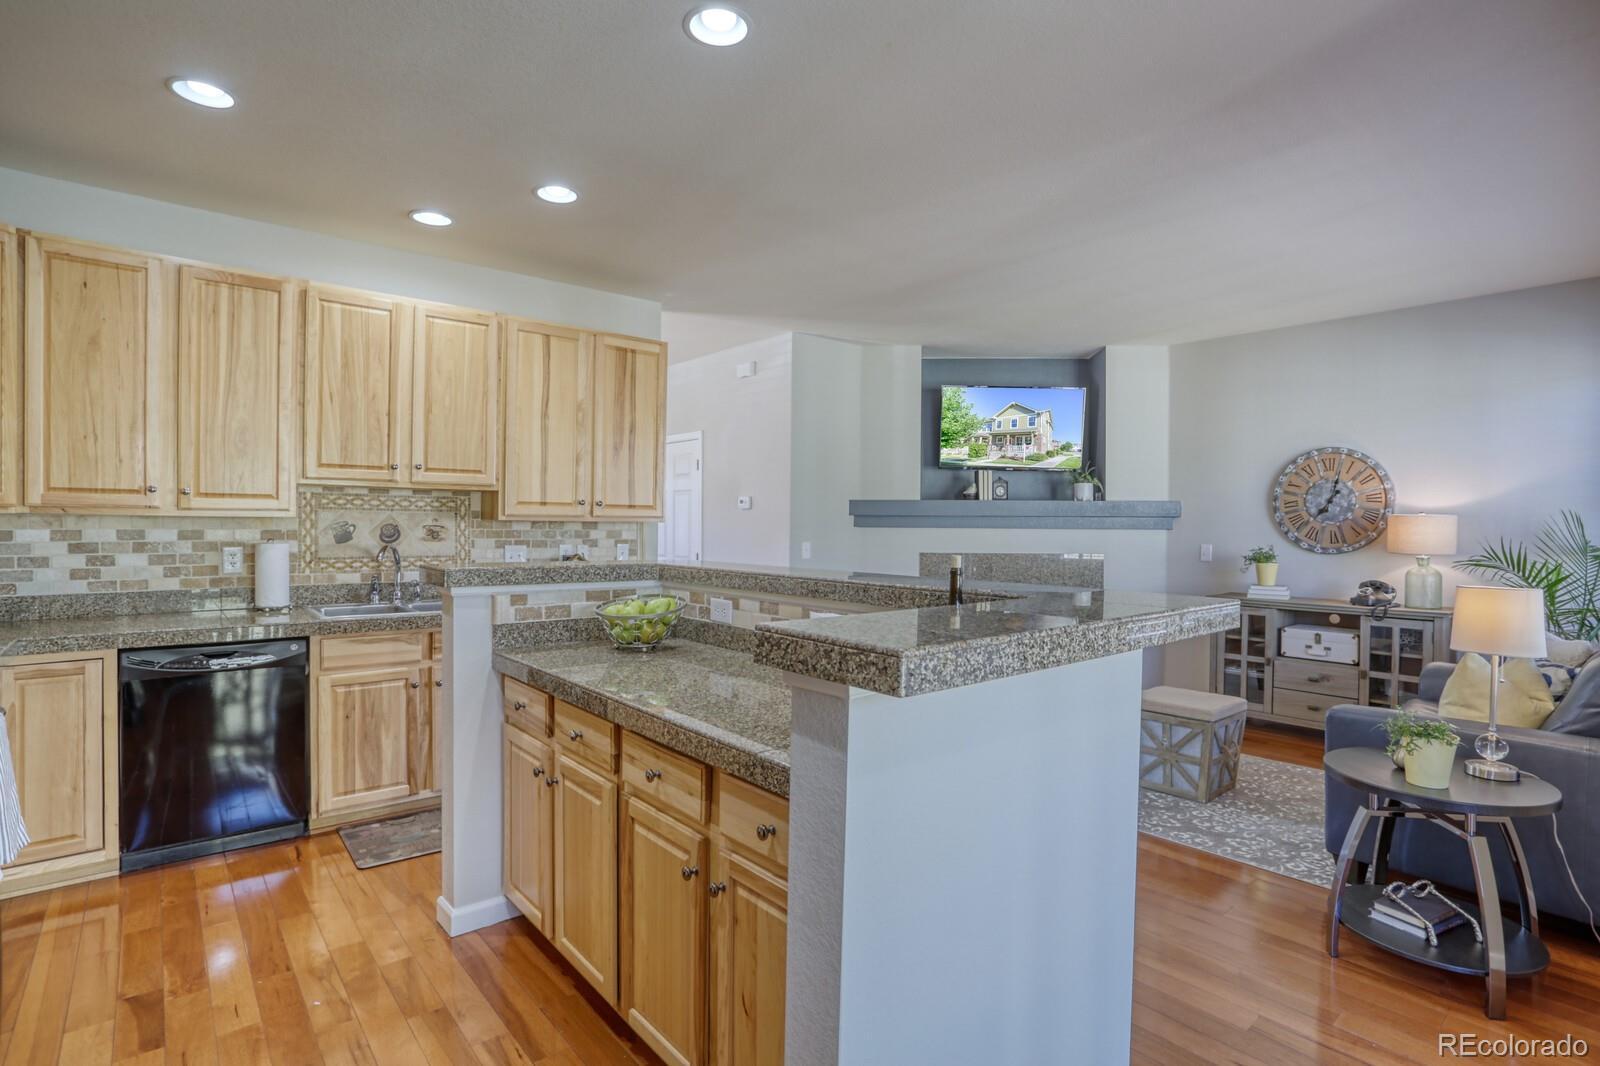 MLS# 8551789 - 14 - 22752 E Briarwood Place, Aurora, CO 80016